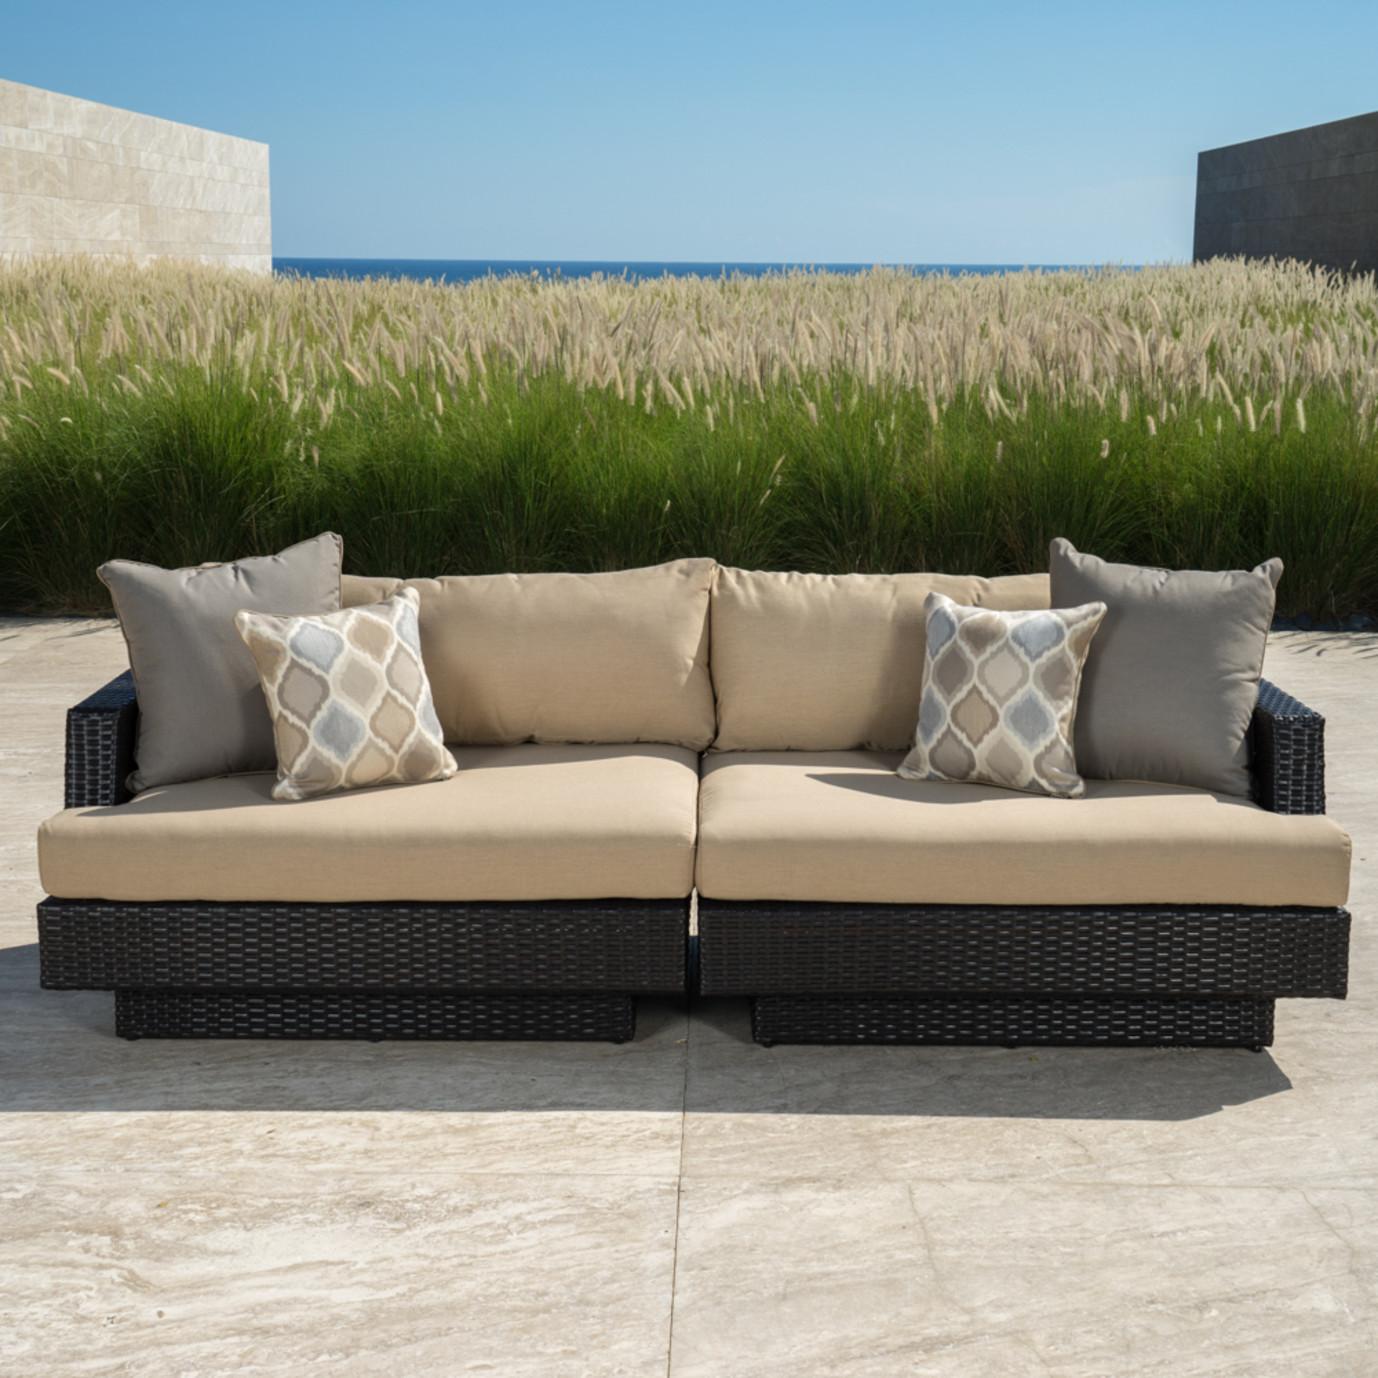 Portofino Comfort 96in 2pc Sofa Heather Beige Rst Brands